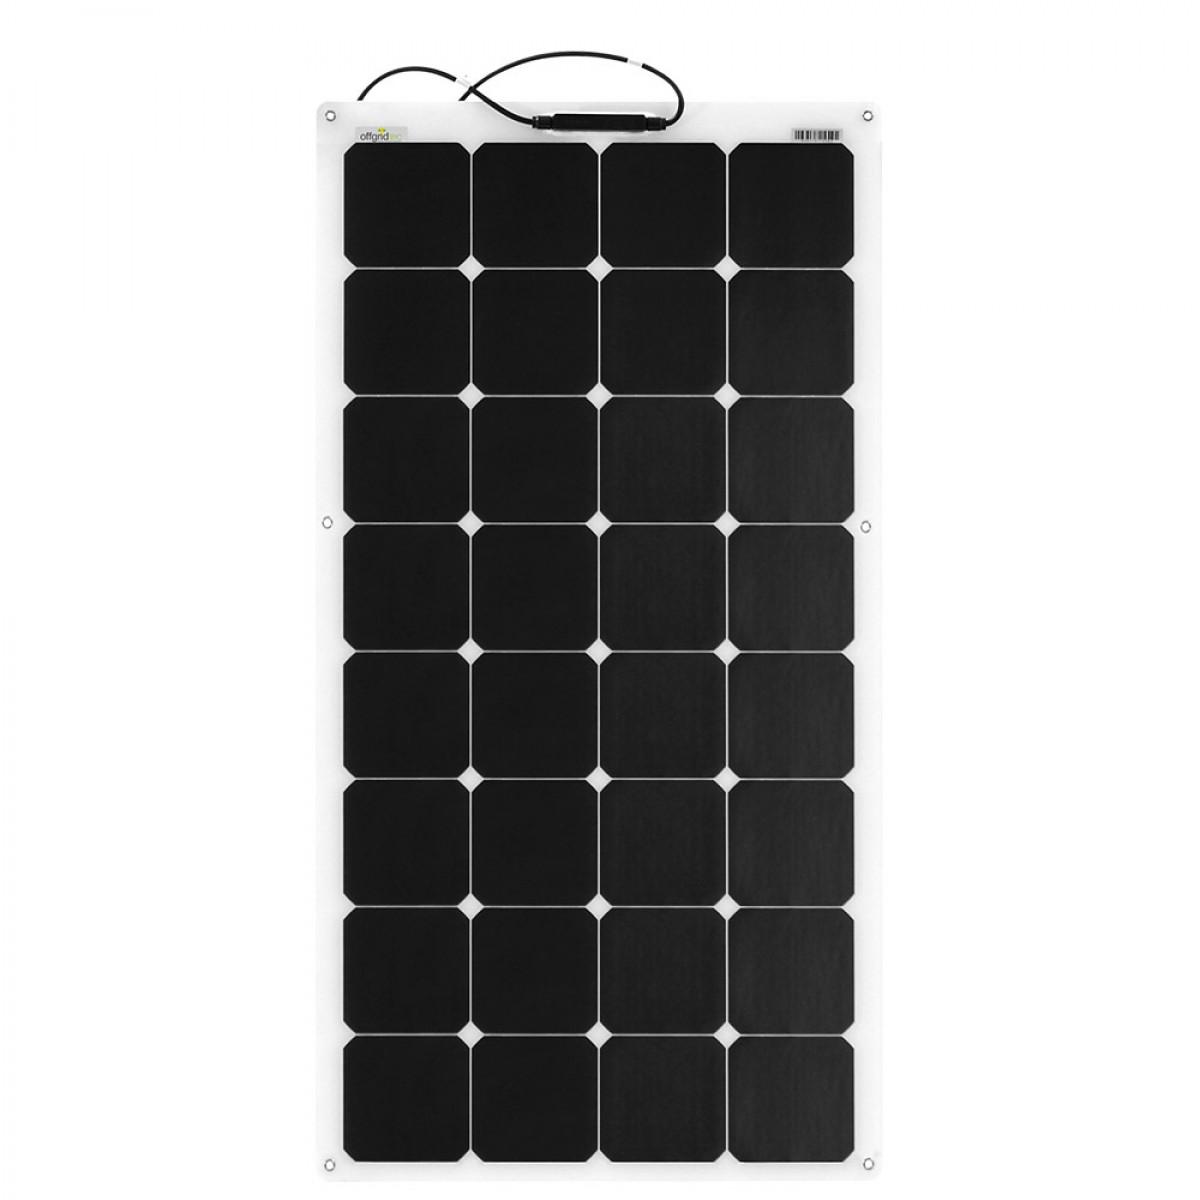 Offgridtec© SPR-F-100 V2 110W 12V flexibles Hochleistungs-Solarmodul